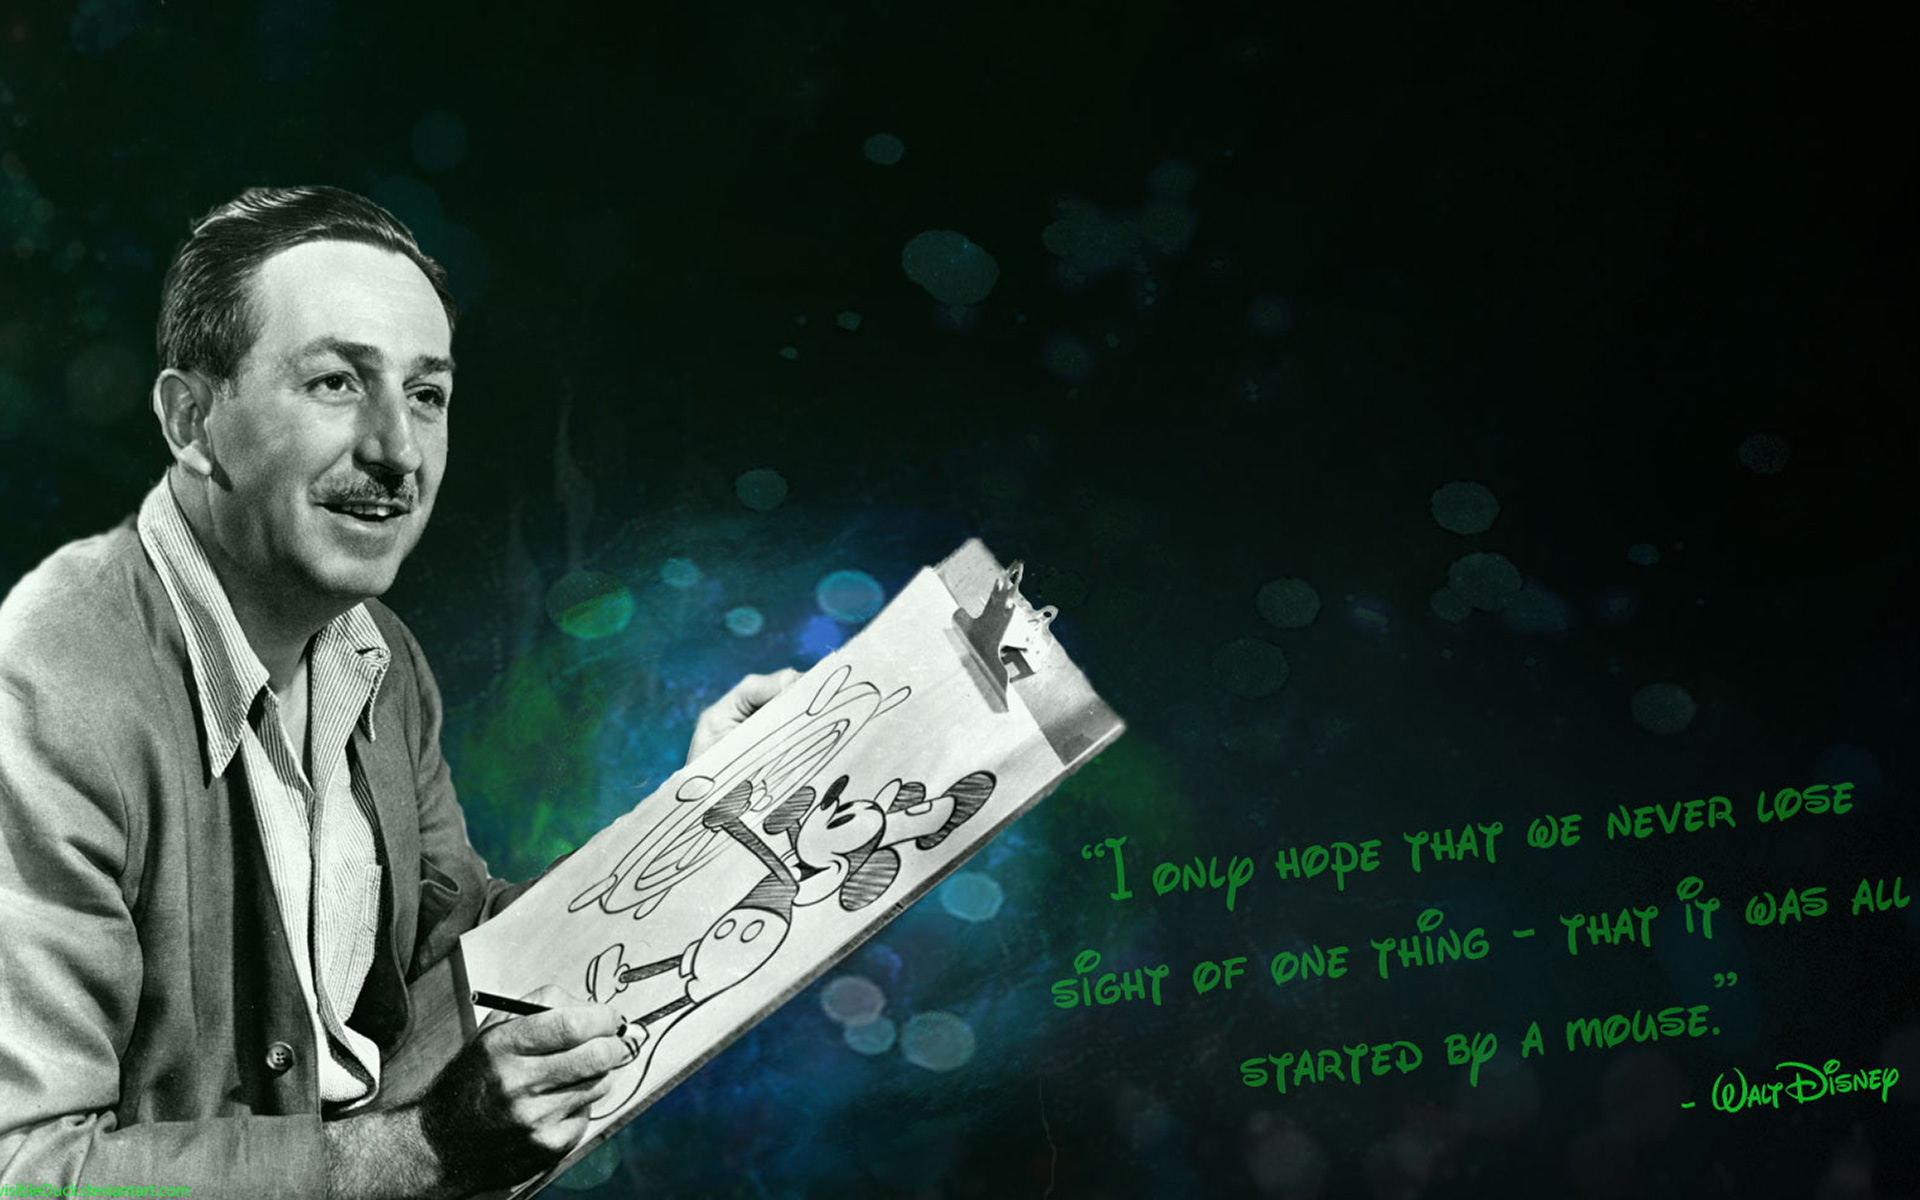 Disney Quotes Desktop Wallpaper QuotesGram 1920x1200